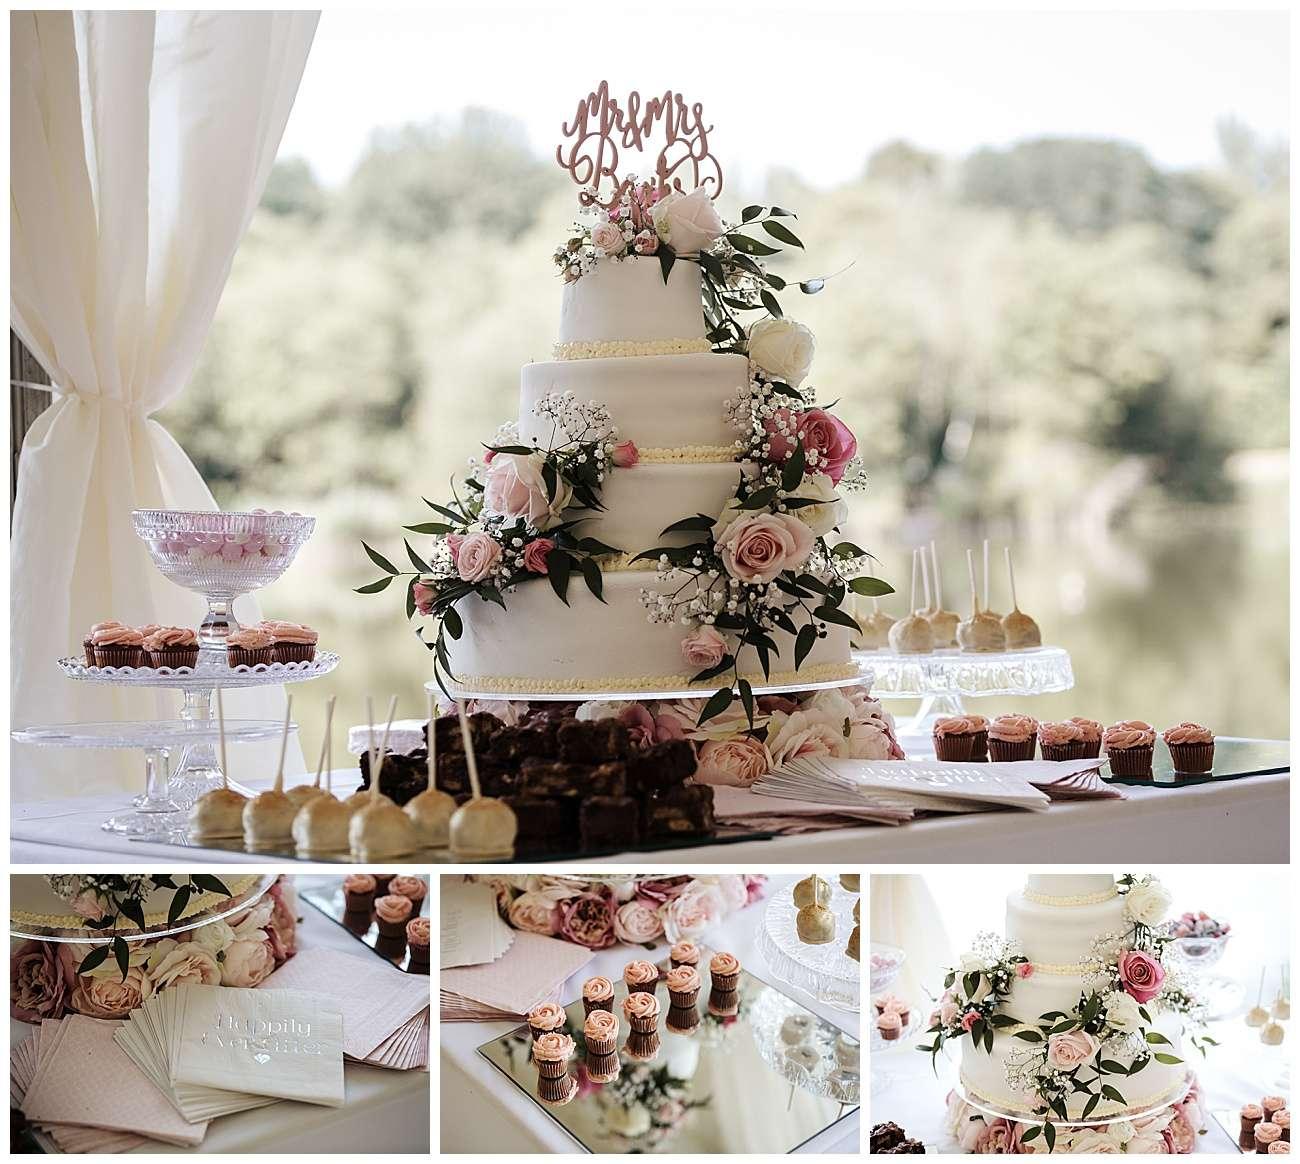 The wedding cake details